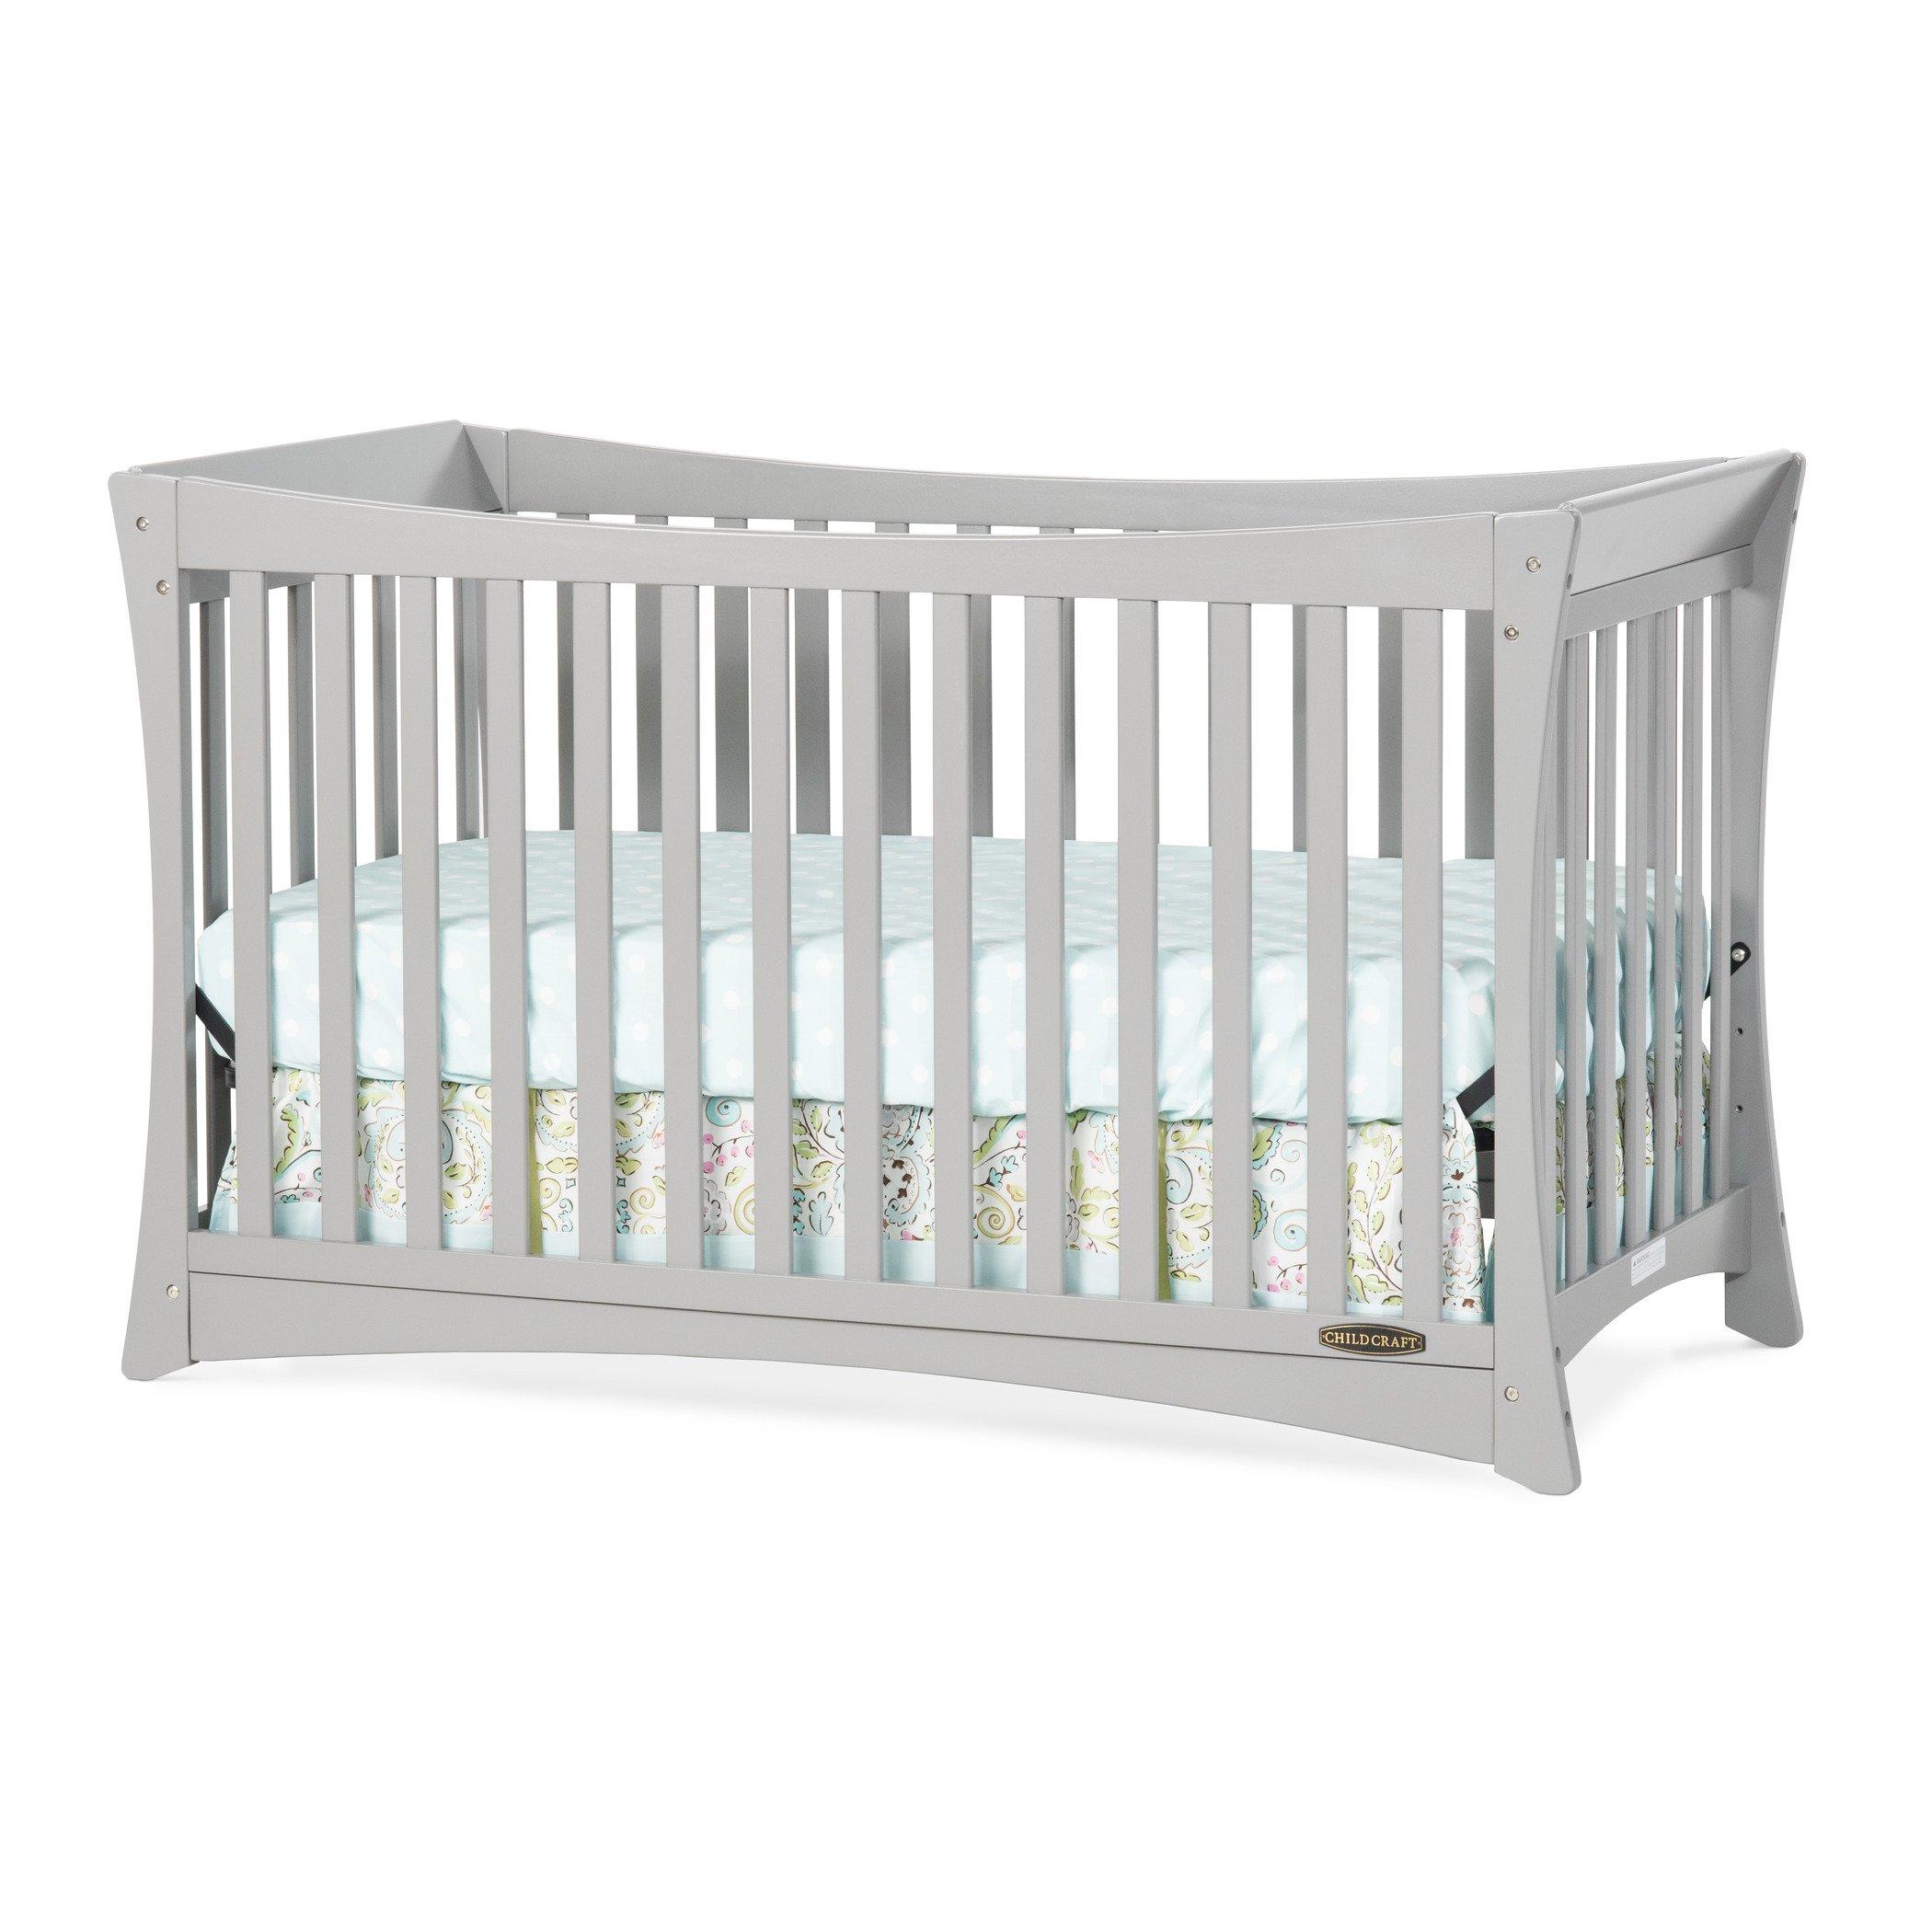 Child Craft Parisian 3-in-1 Convertible Crib, Cool Gray